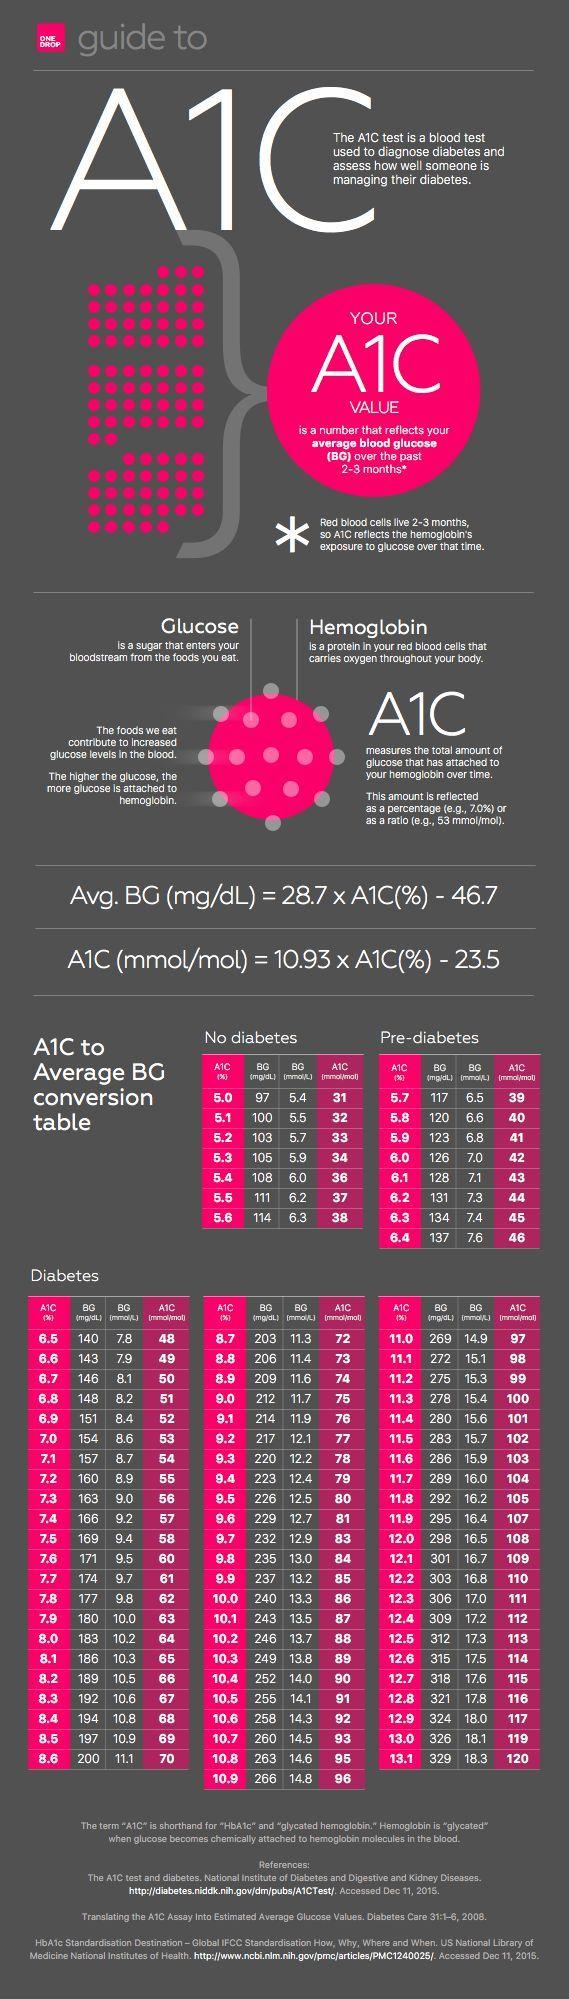 A1c average blood glucoseblood sugar explanation and conversion a1c average blood glucoseblood sugar explanation and conversion chart nvjuhfo Image collections